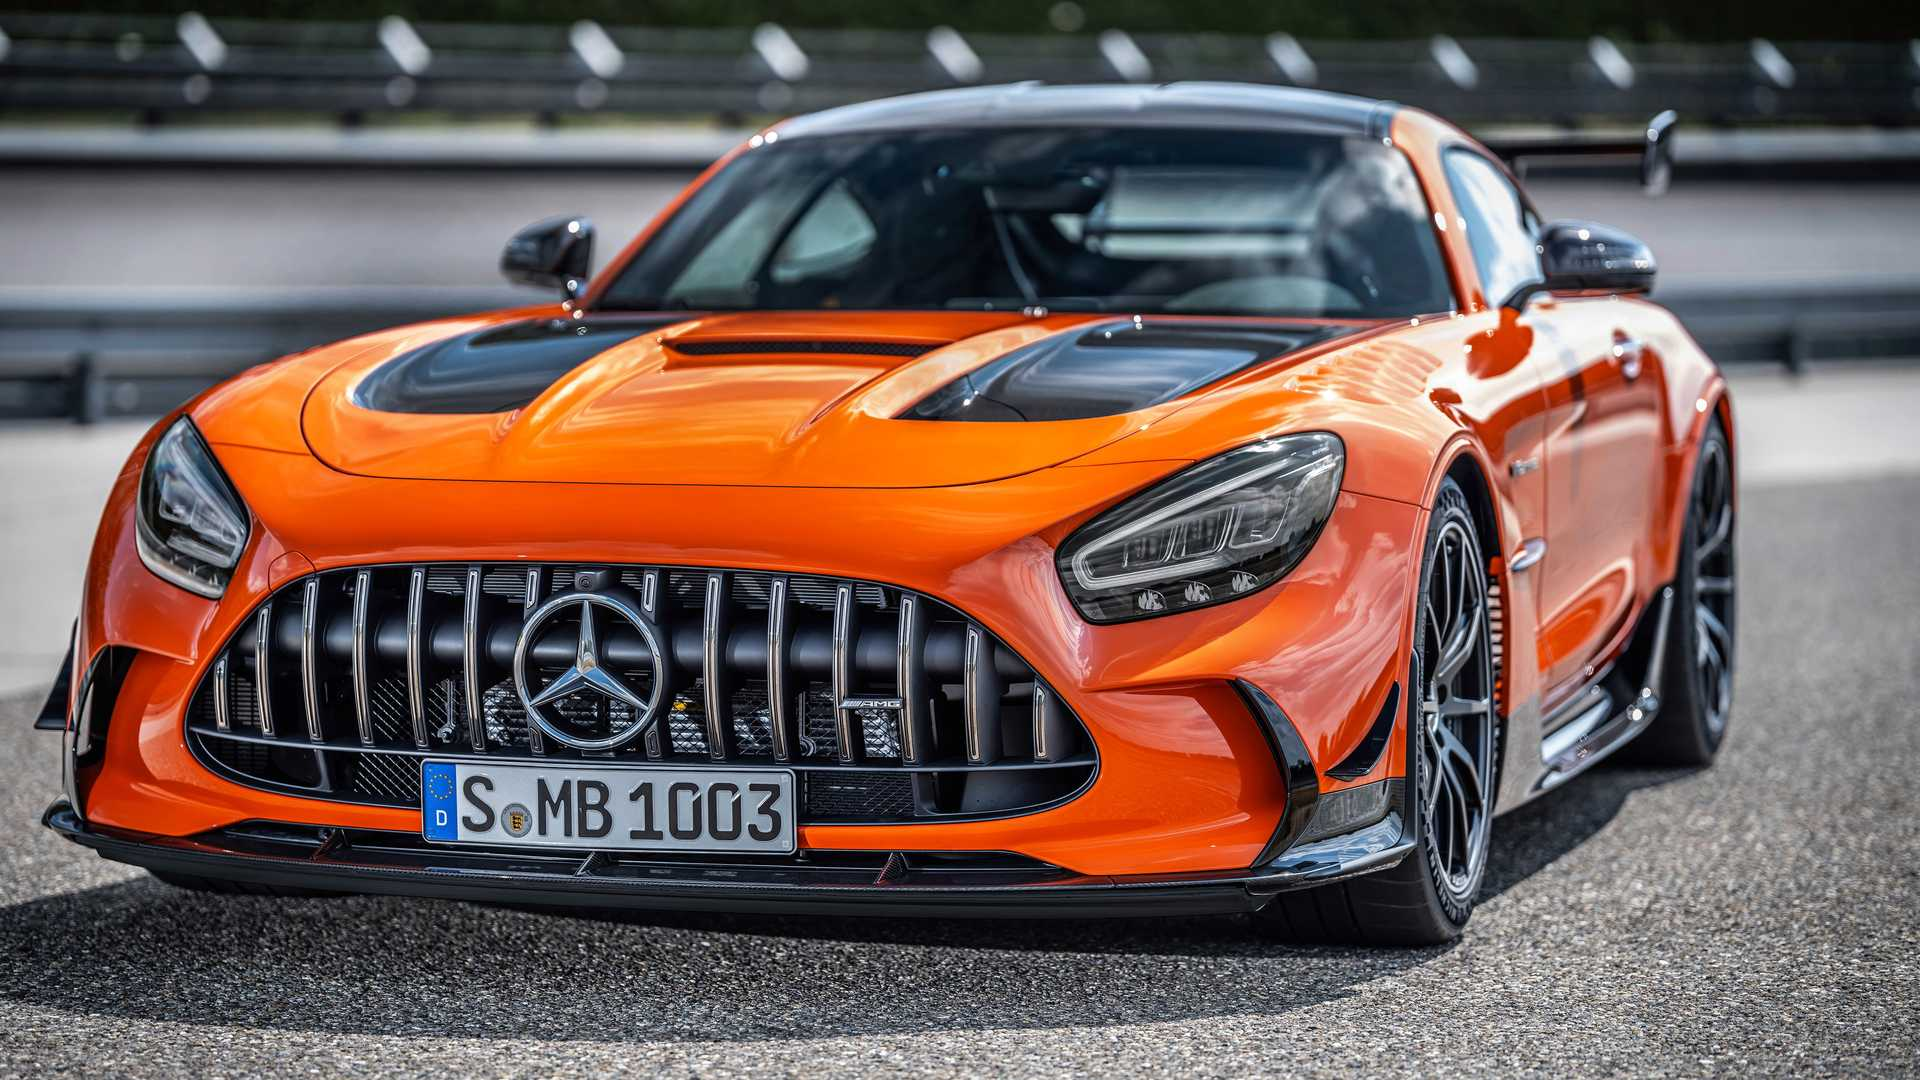 2014 - [Mercedes-AMG] GT [C190] - Page 33 2021-mercedes-amg-gt-black-series